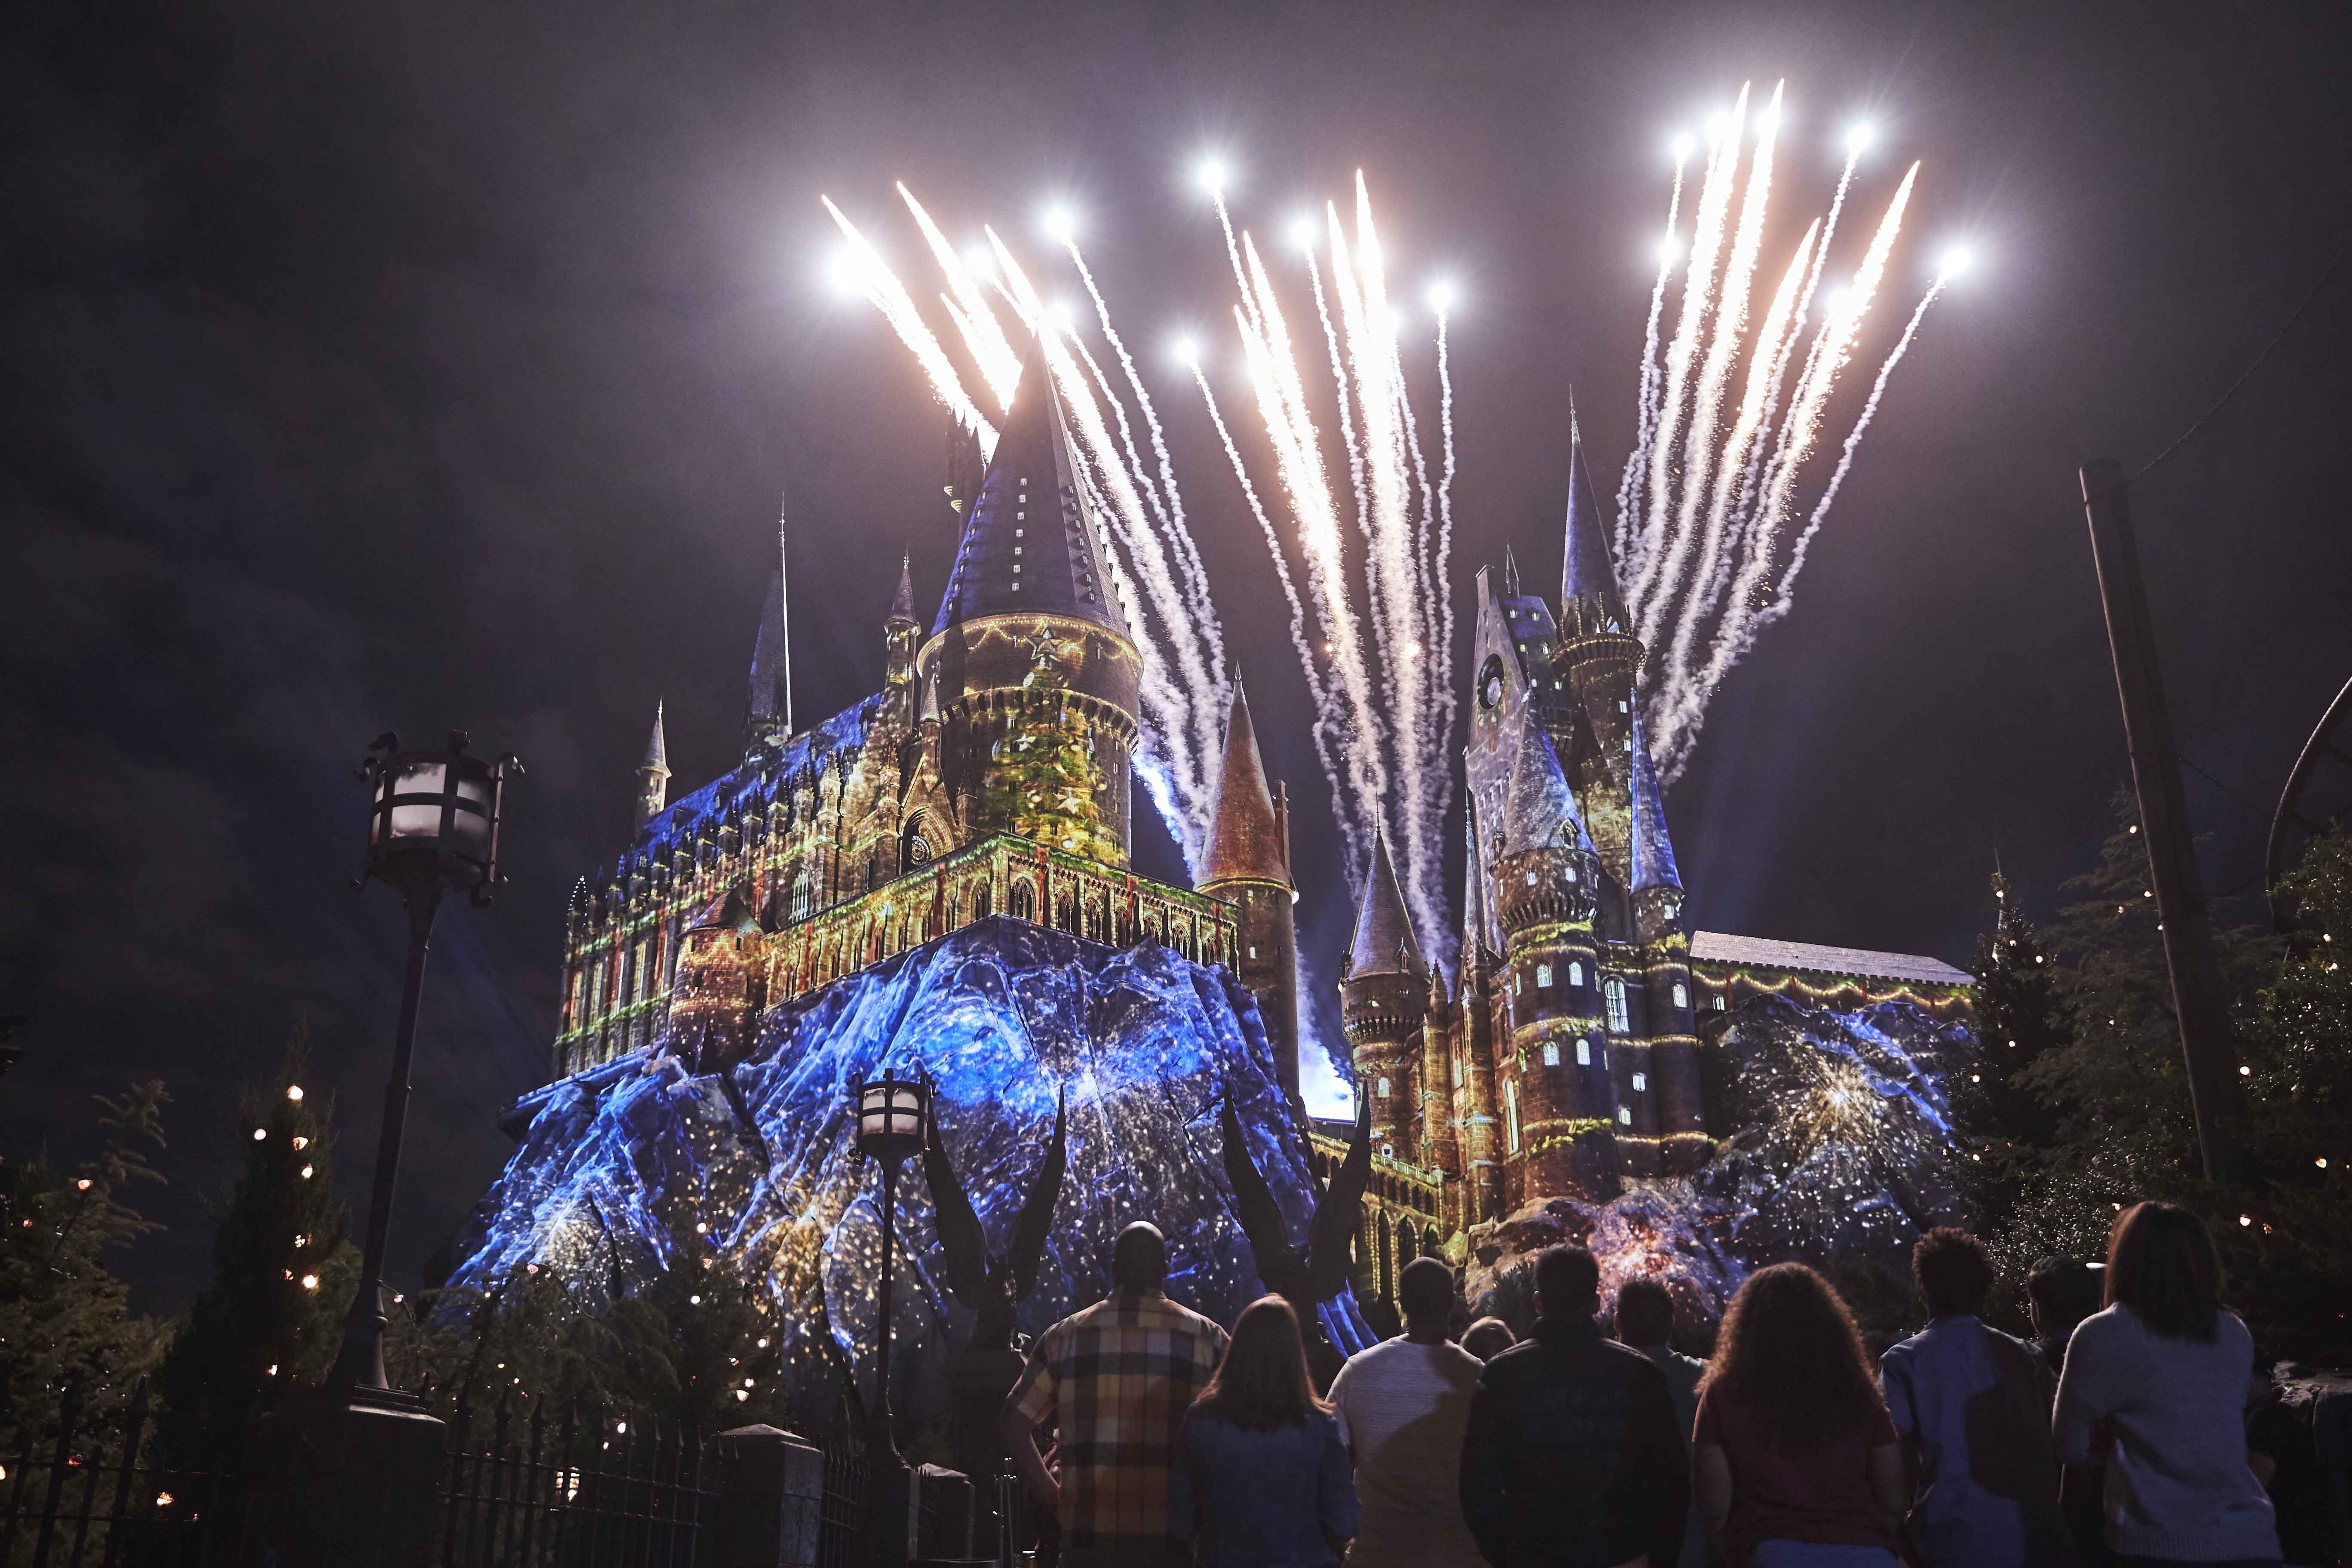 Orlando Christmas Harry Potter 2020 Holiday Magic Transfigures Universal Orlando Resort for Christmas